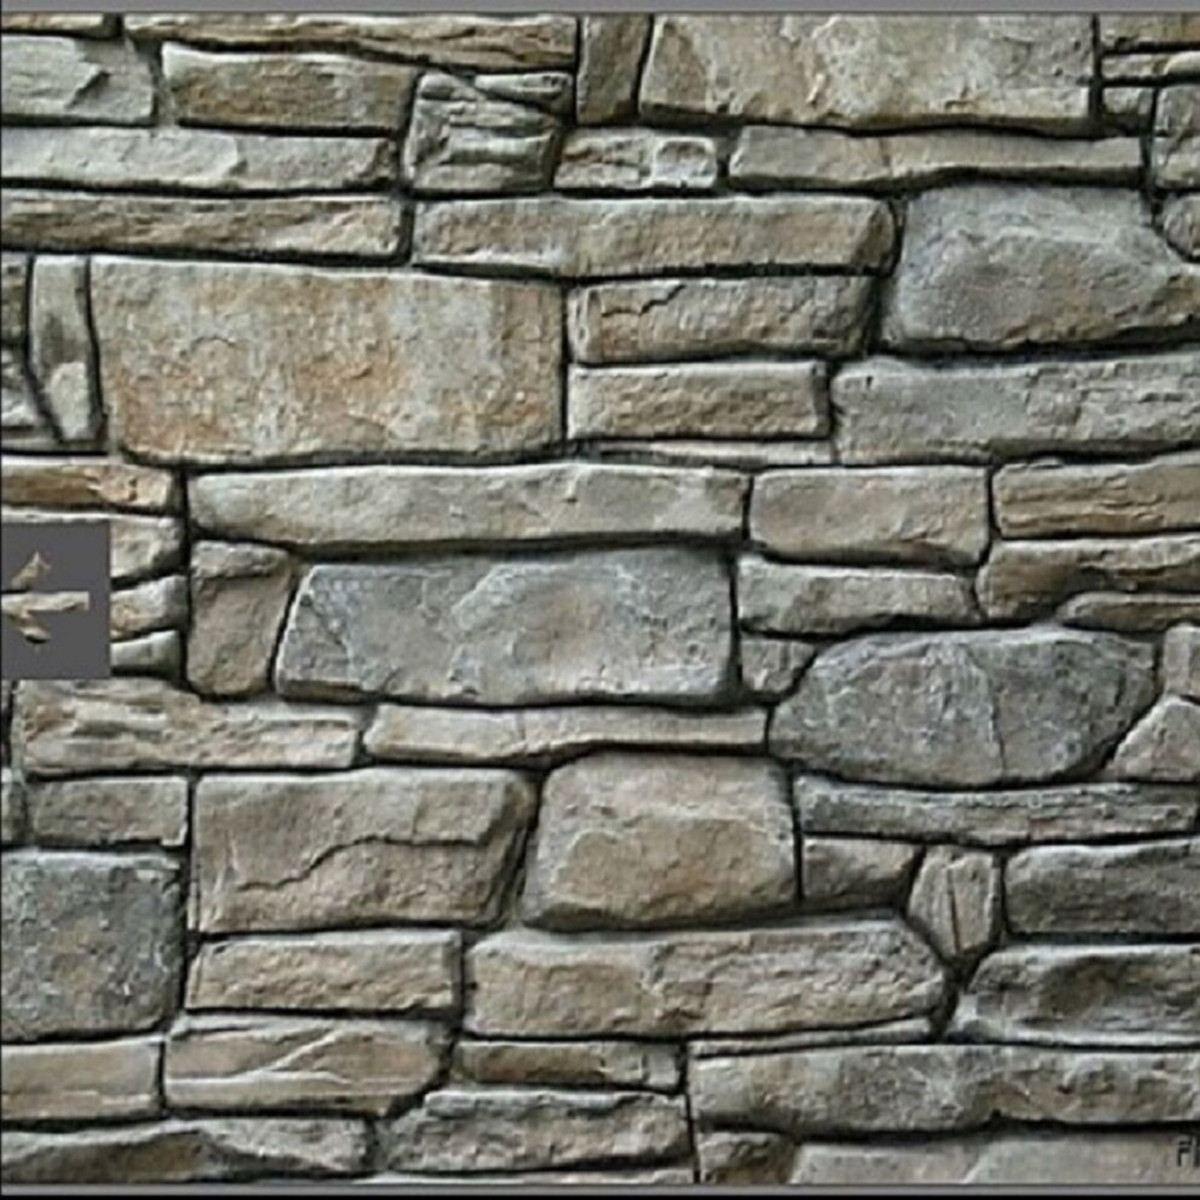 Stone Decorative Concrete Mold Cement Reusable Brick Mold Imprint Texture Stamp Mat Rubber Molds Garden House Decor Texture Wall